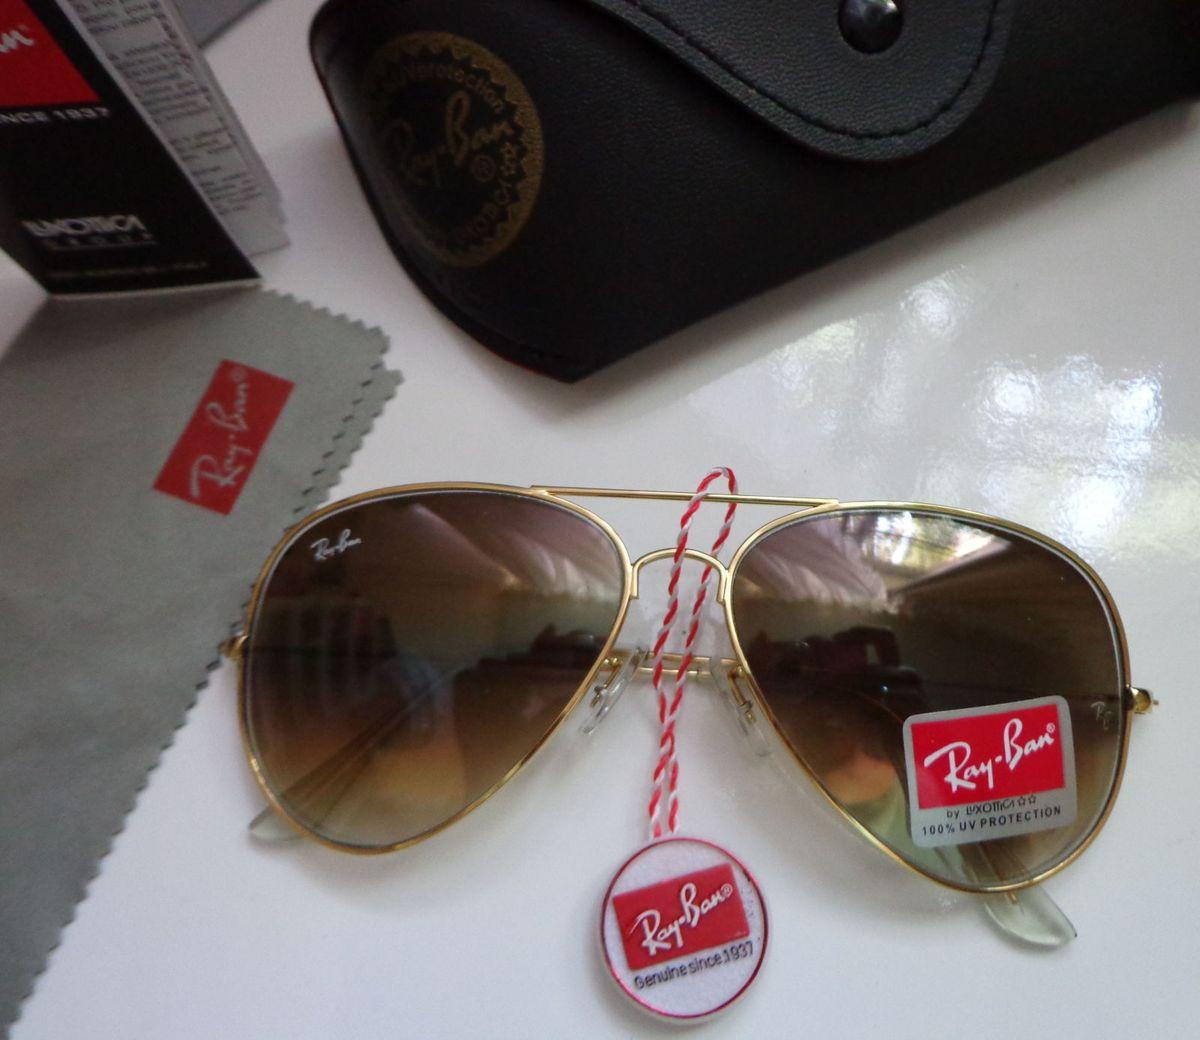 aviador - óculos ray-ban.  Czm6ly9wag90b3muzw5qb2vplmnvbs5ici9wcm9kdwn0cy8xnji4mzavnwi1zjnlzjgzntljy2q4zdy4otiyymnmzje1ztnmnjeuanbn  ... 216366ca88